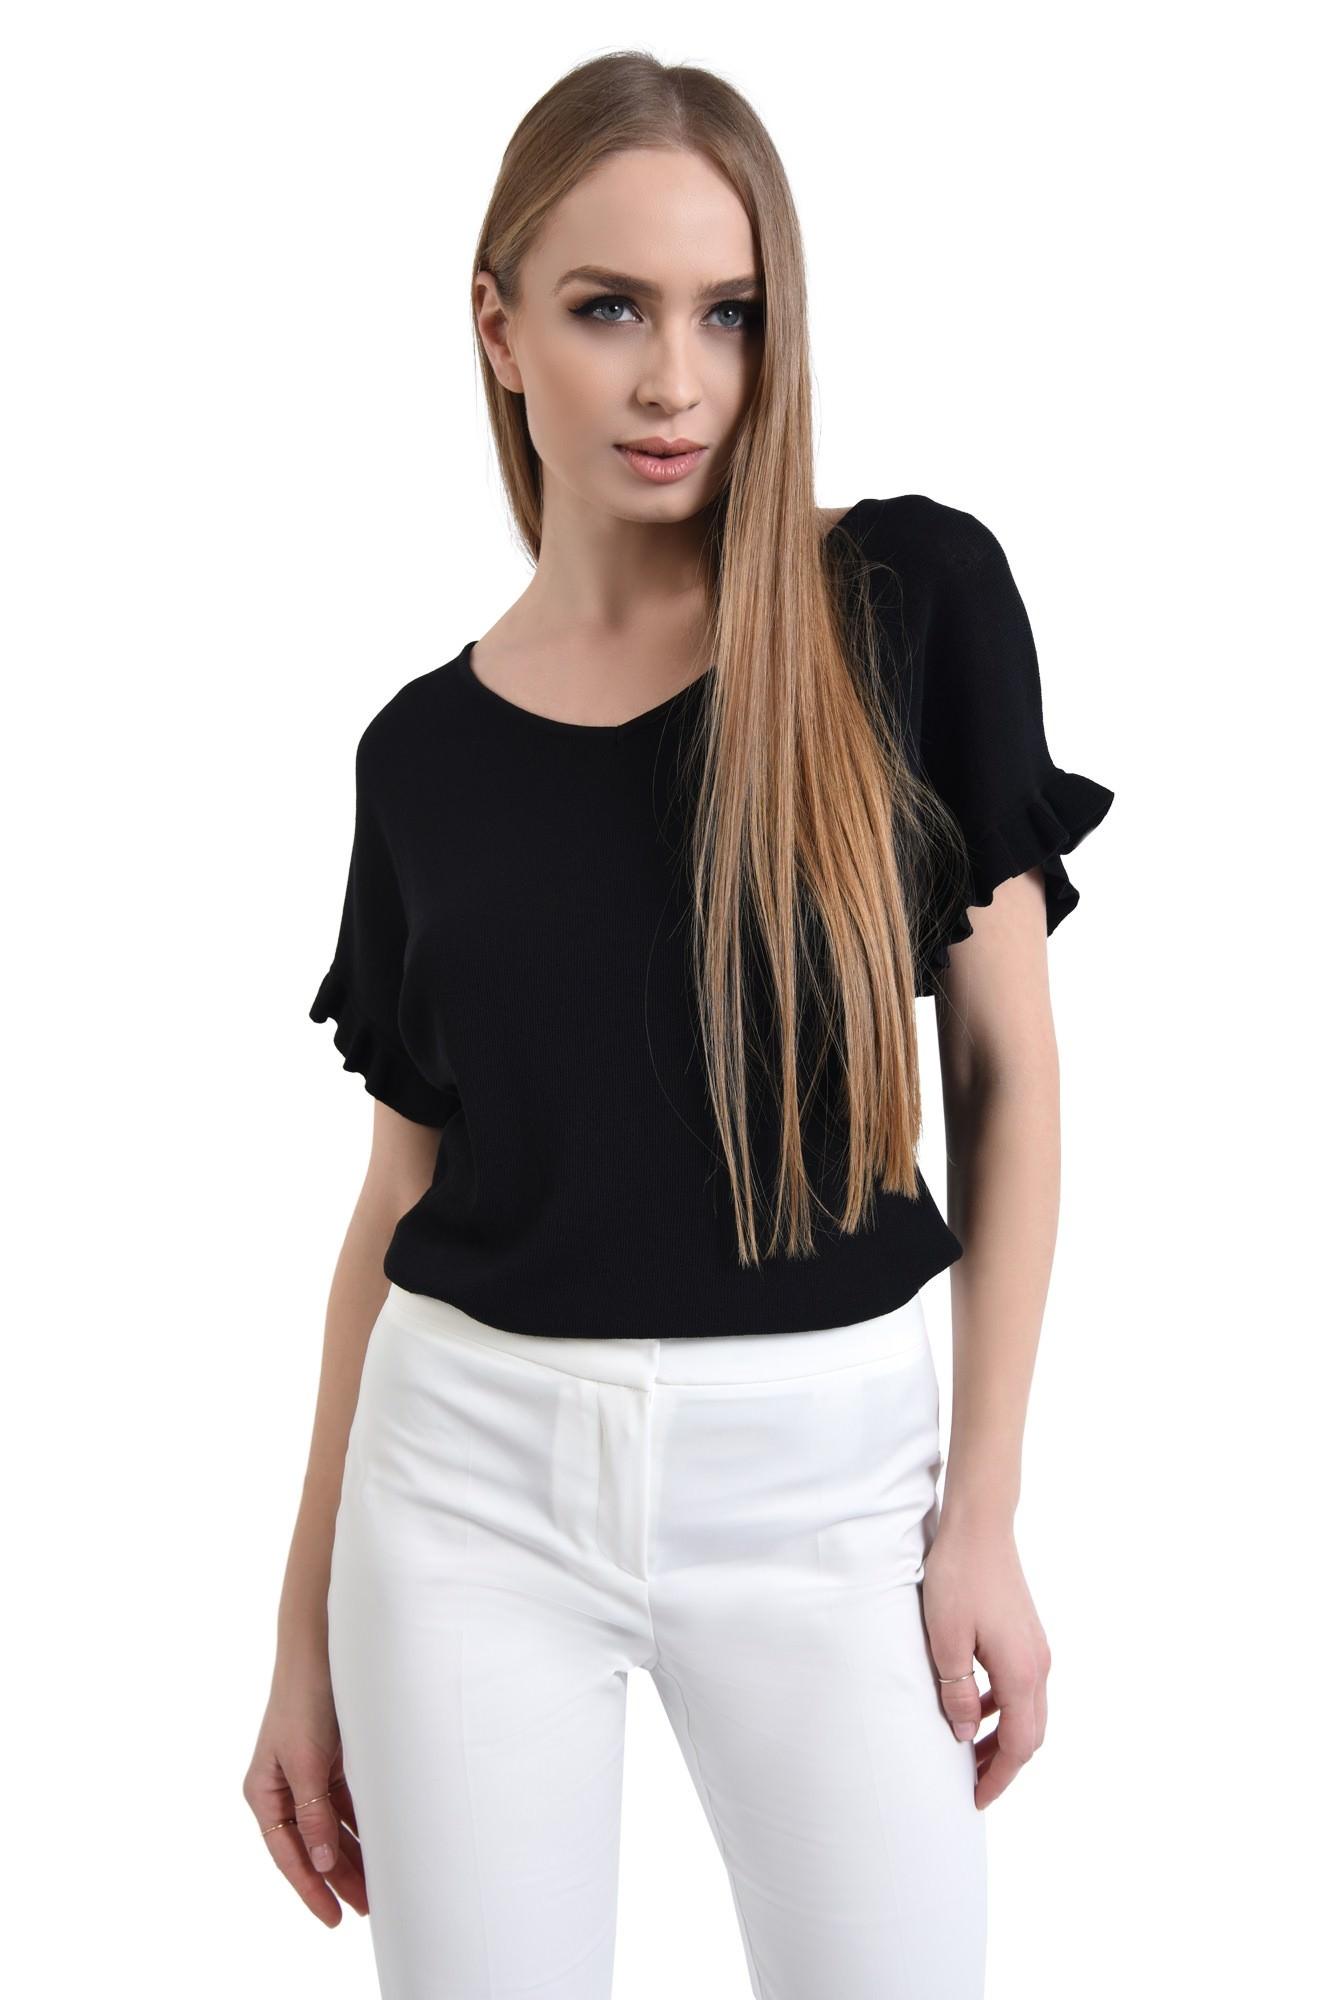 0 - Bluza casual, tricotaj, negru